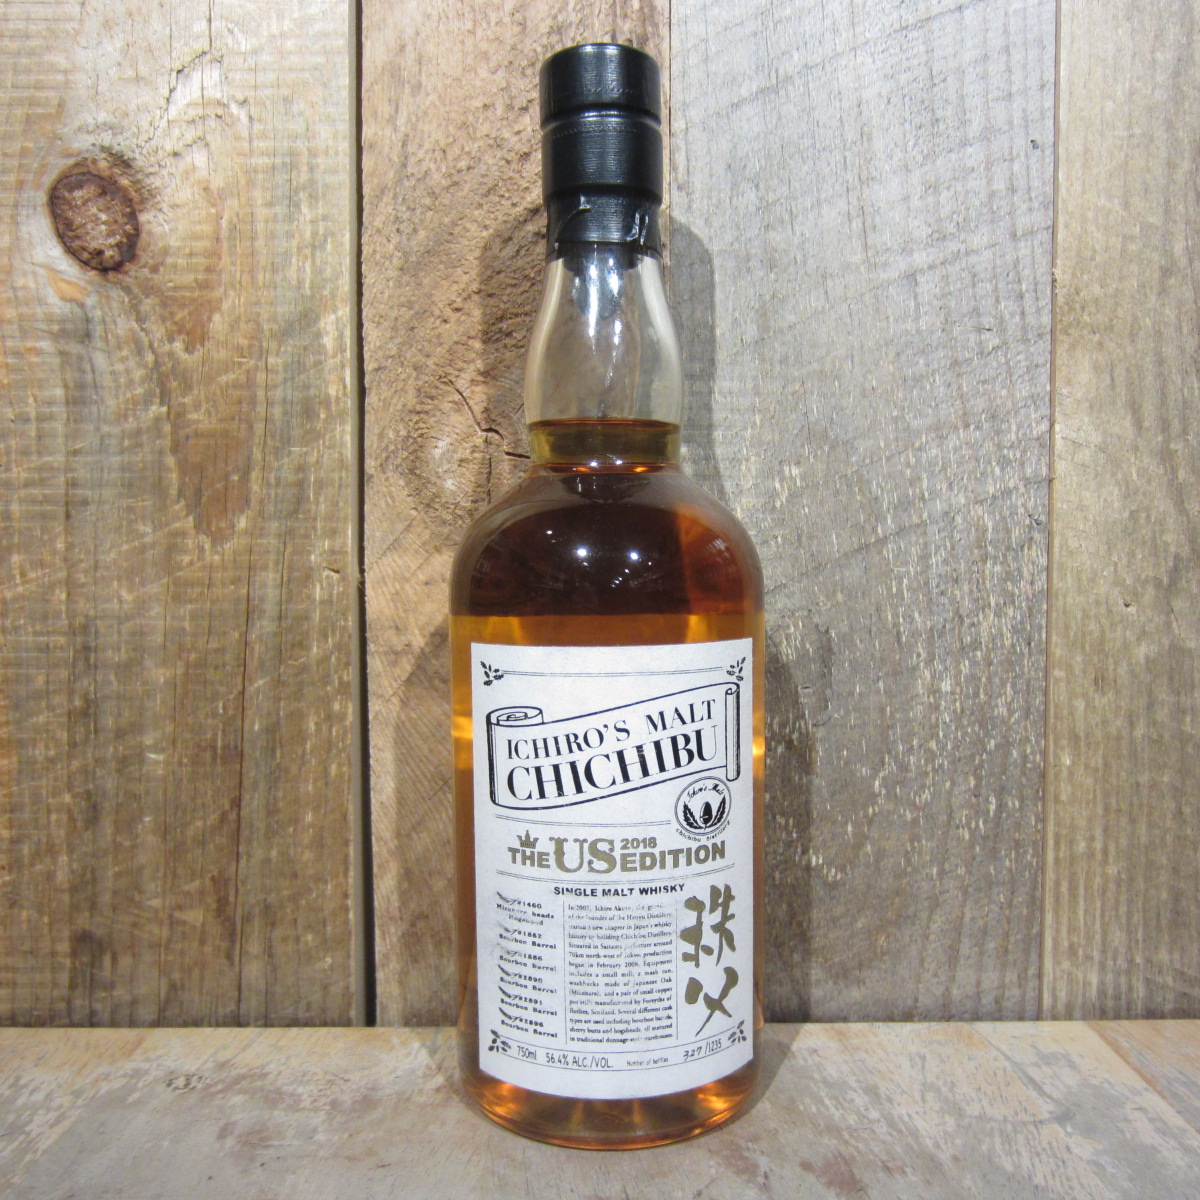 Chichibu Ichiros Malt Us 2018 Edition Whiskey Single Malt 750ml